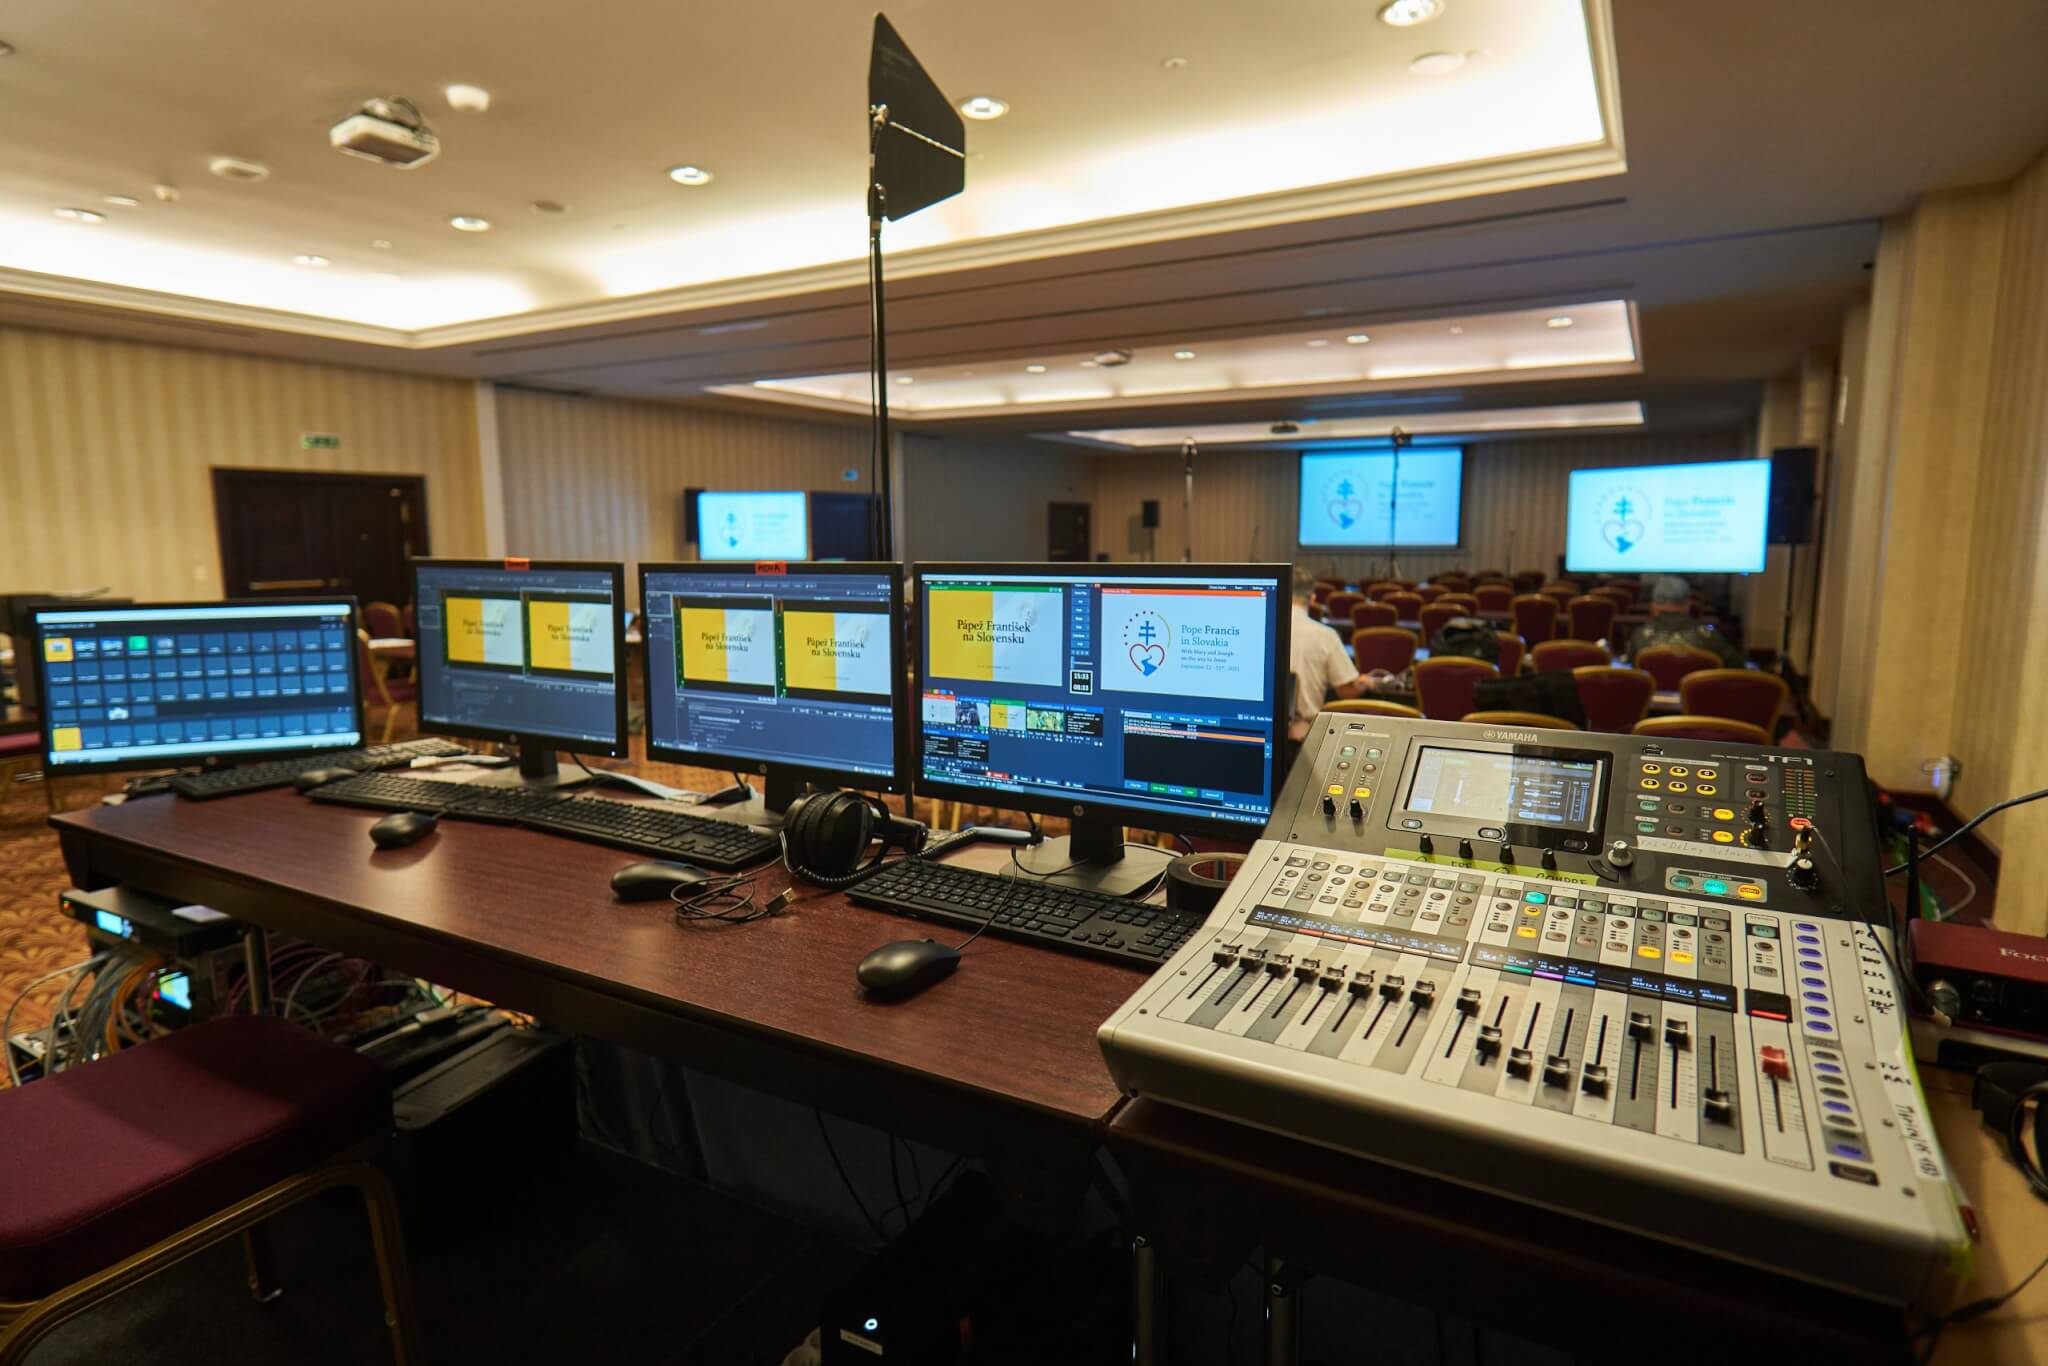 MediaTech-audio-video-technology